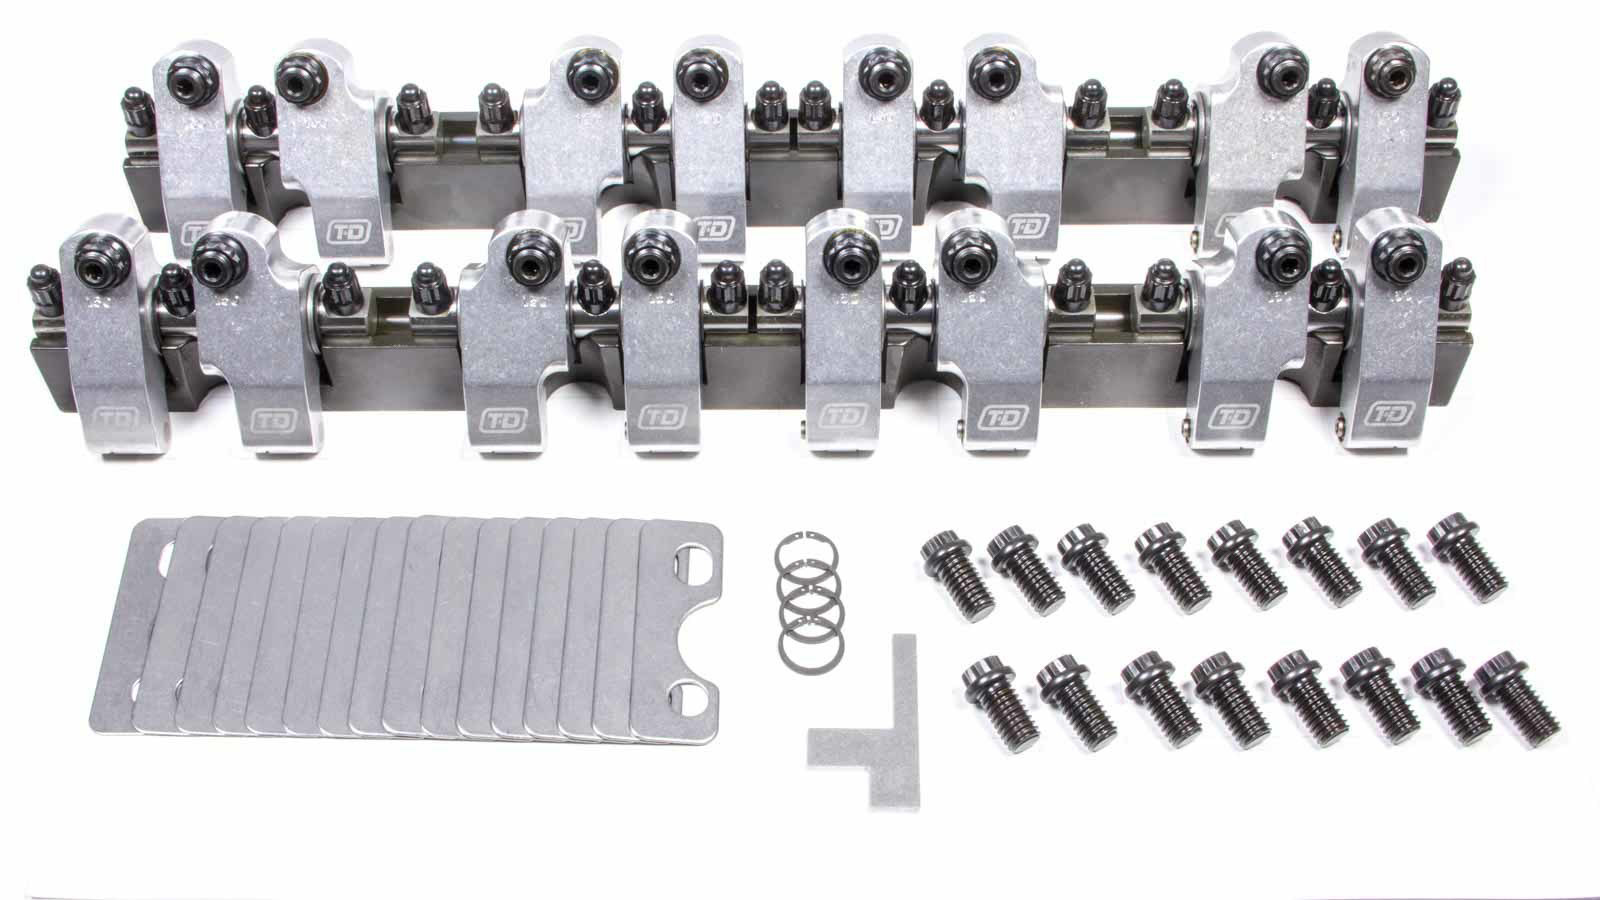 T&D Machine 2300-160/160 Rocker Arm, Shaft Mount, 1.60 Ratio, Full Roller, Aluminum, Natural, AFR 227 / 235, Small Block Chevy, Kit